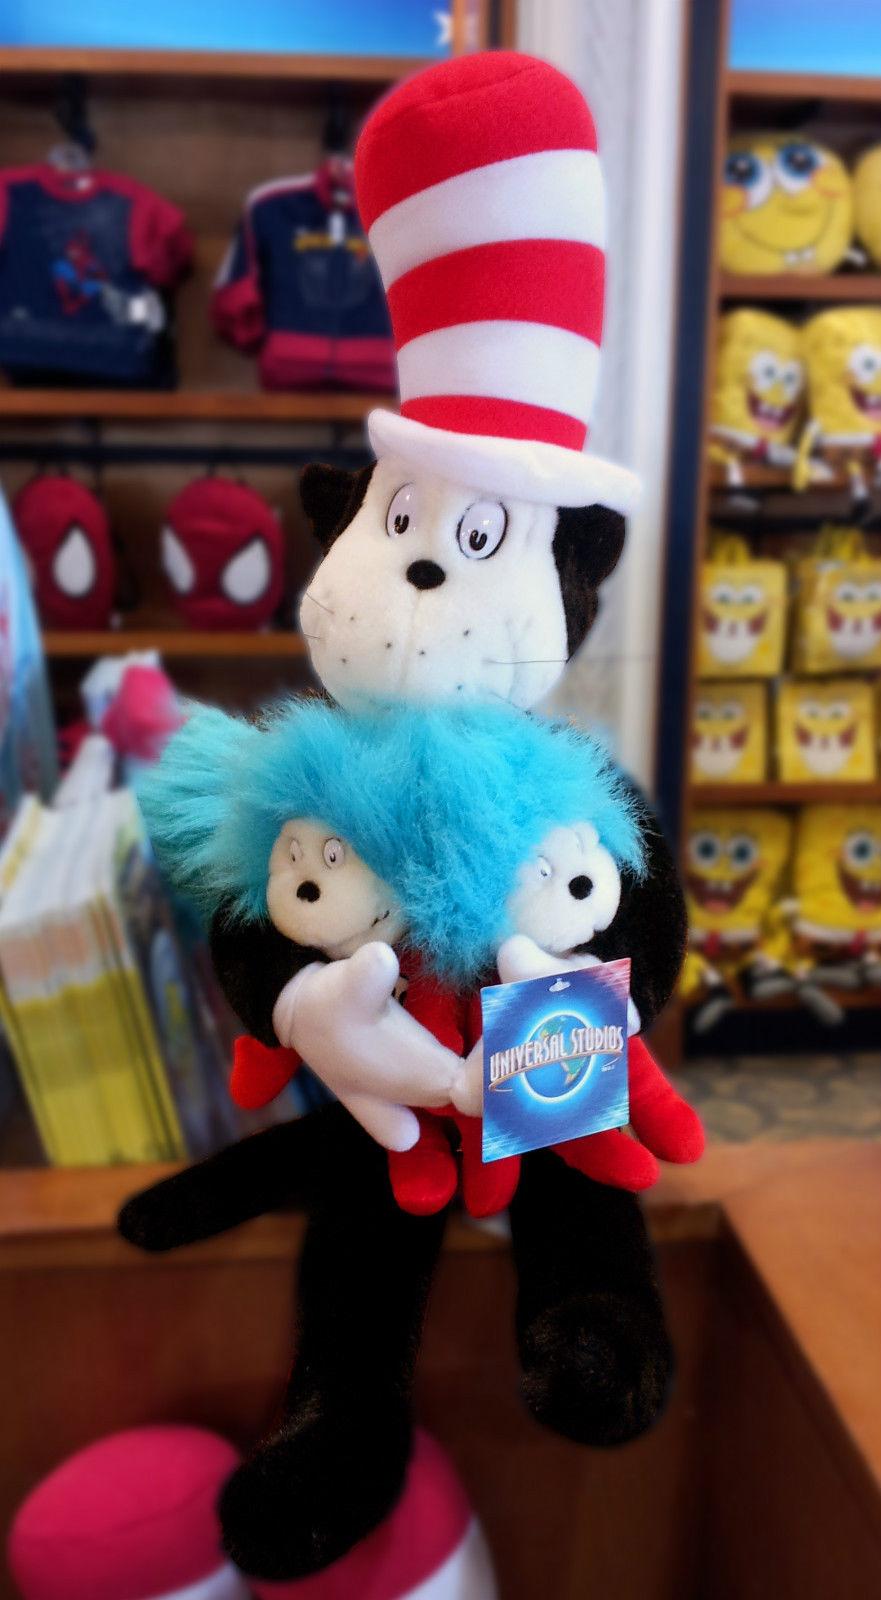 Dr Seuss Universal Studios Cat In The Hat Plush Hugging Thing 1 2